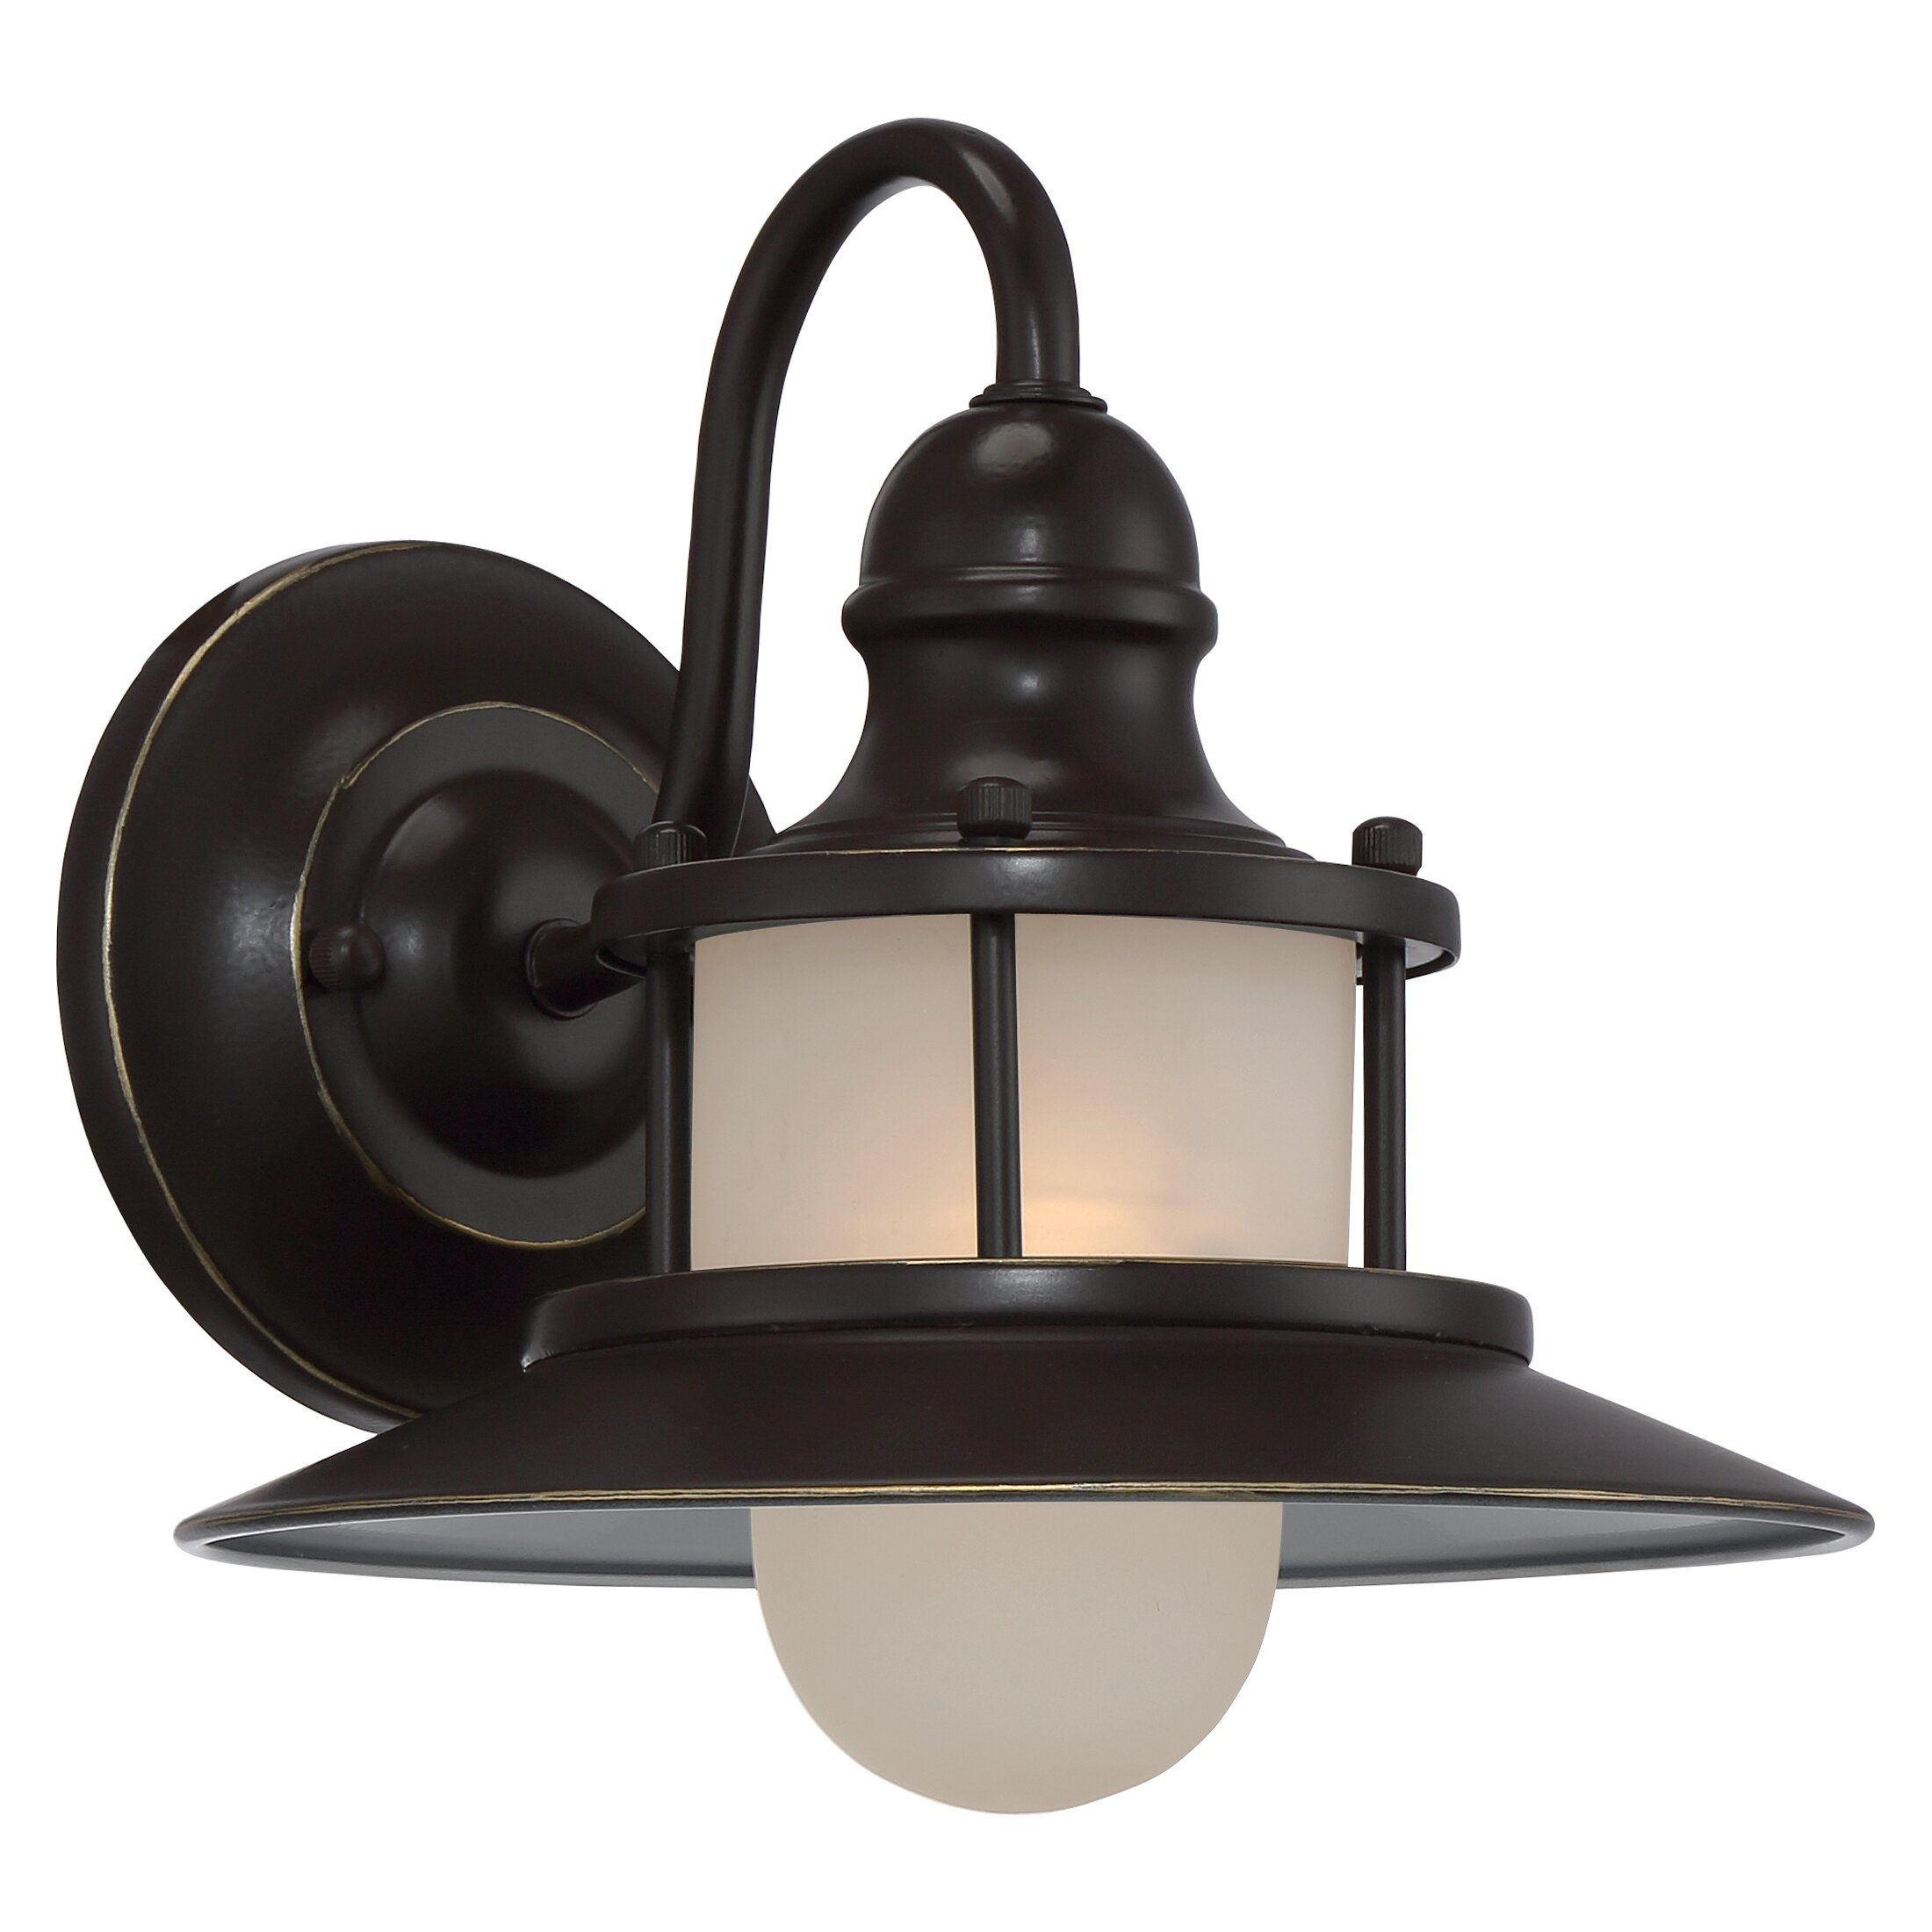 Goodyear 1 Light Outdoor Barn Light: Breakwater Bay Commodore 1 Light Outdoor Barn Light